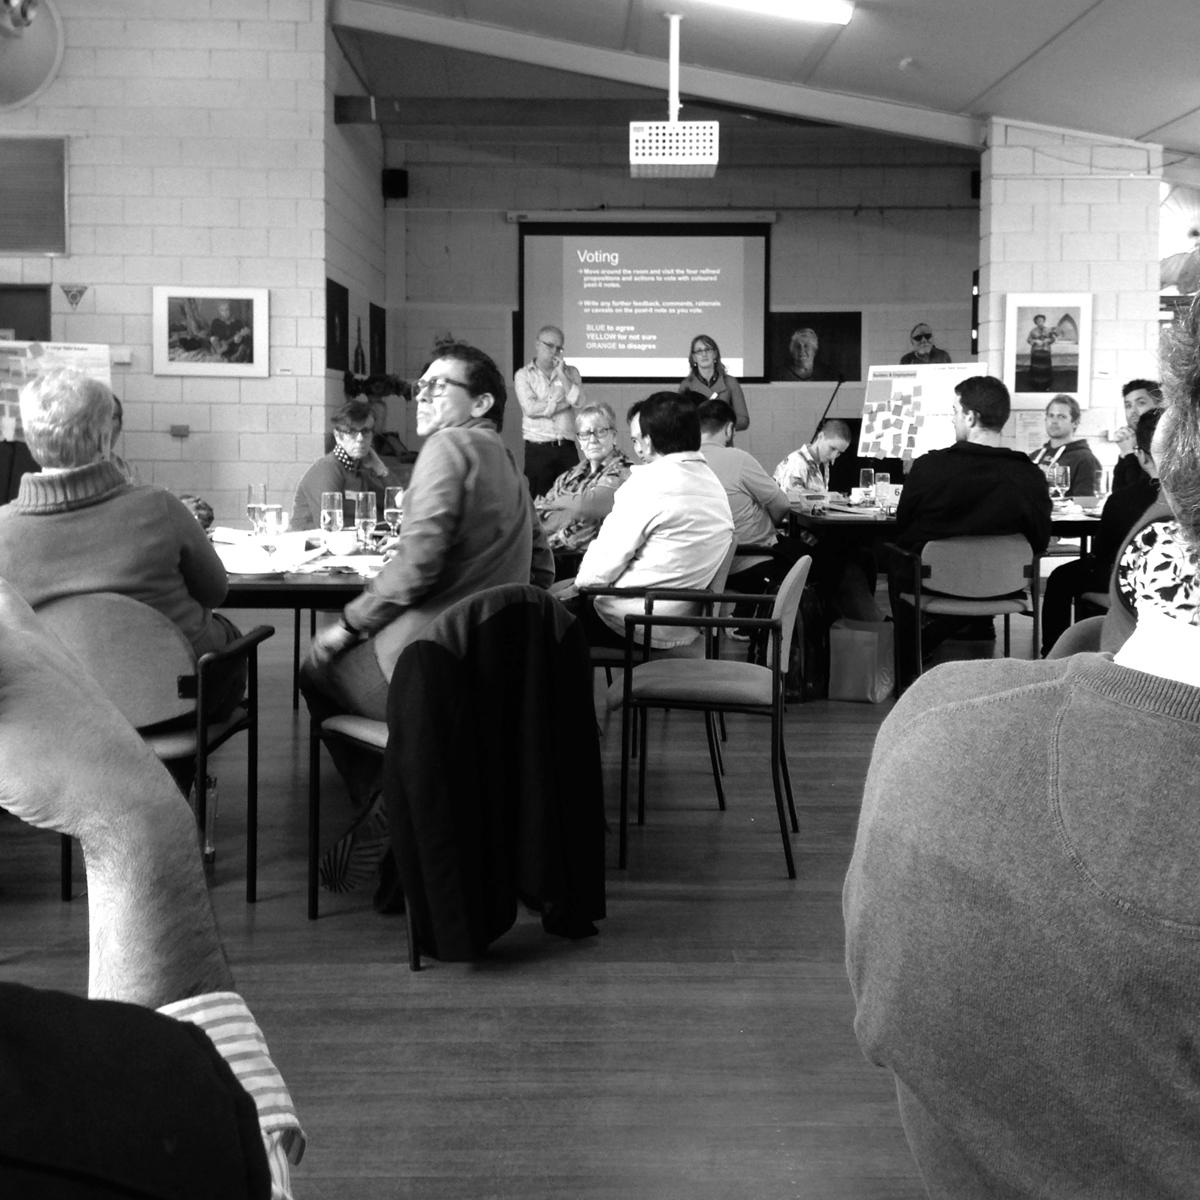 City of Yarra, Community engagement, Urban planning, People's panel